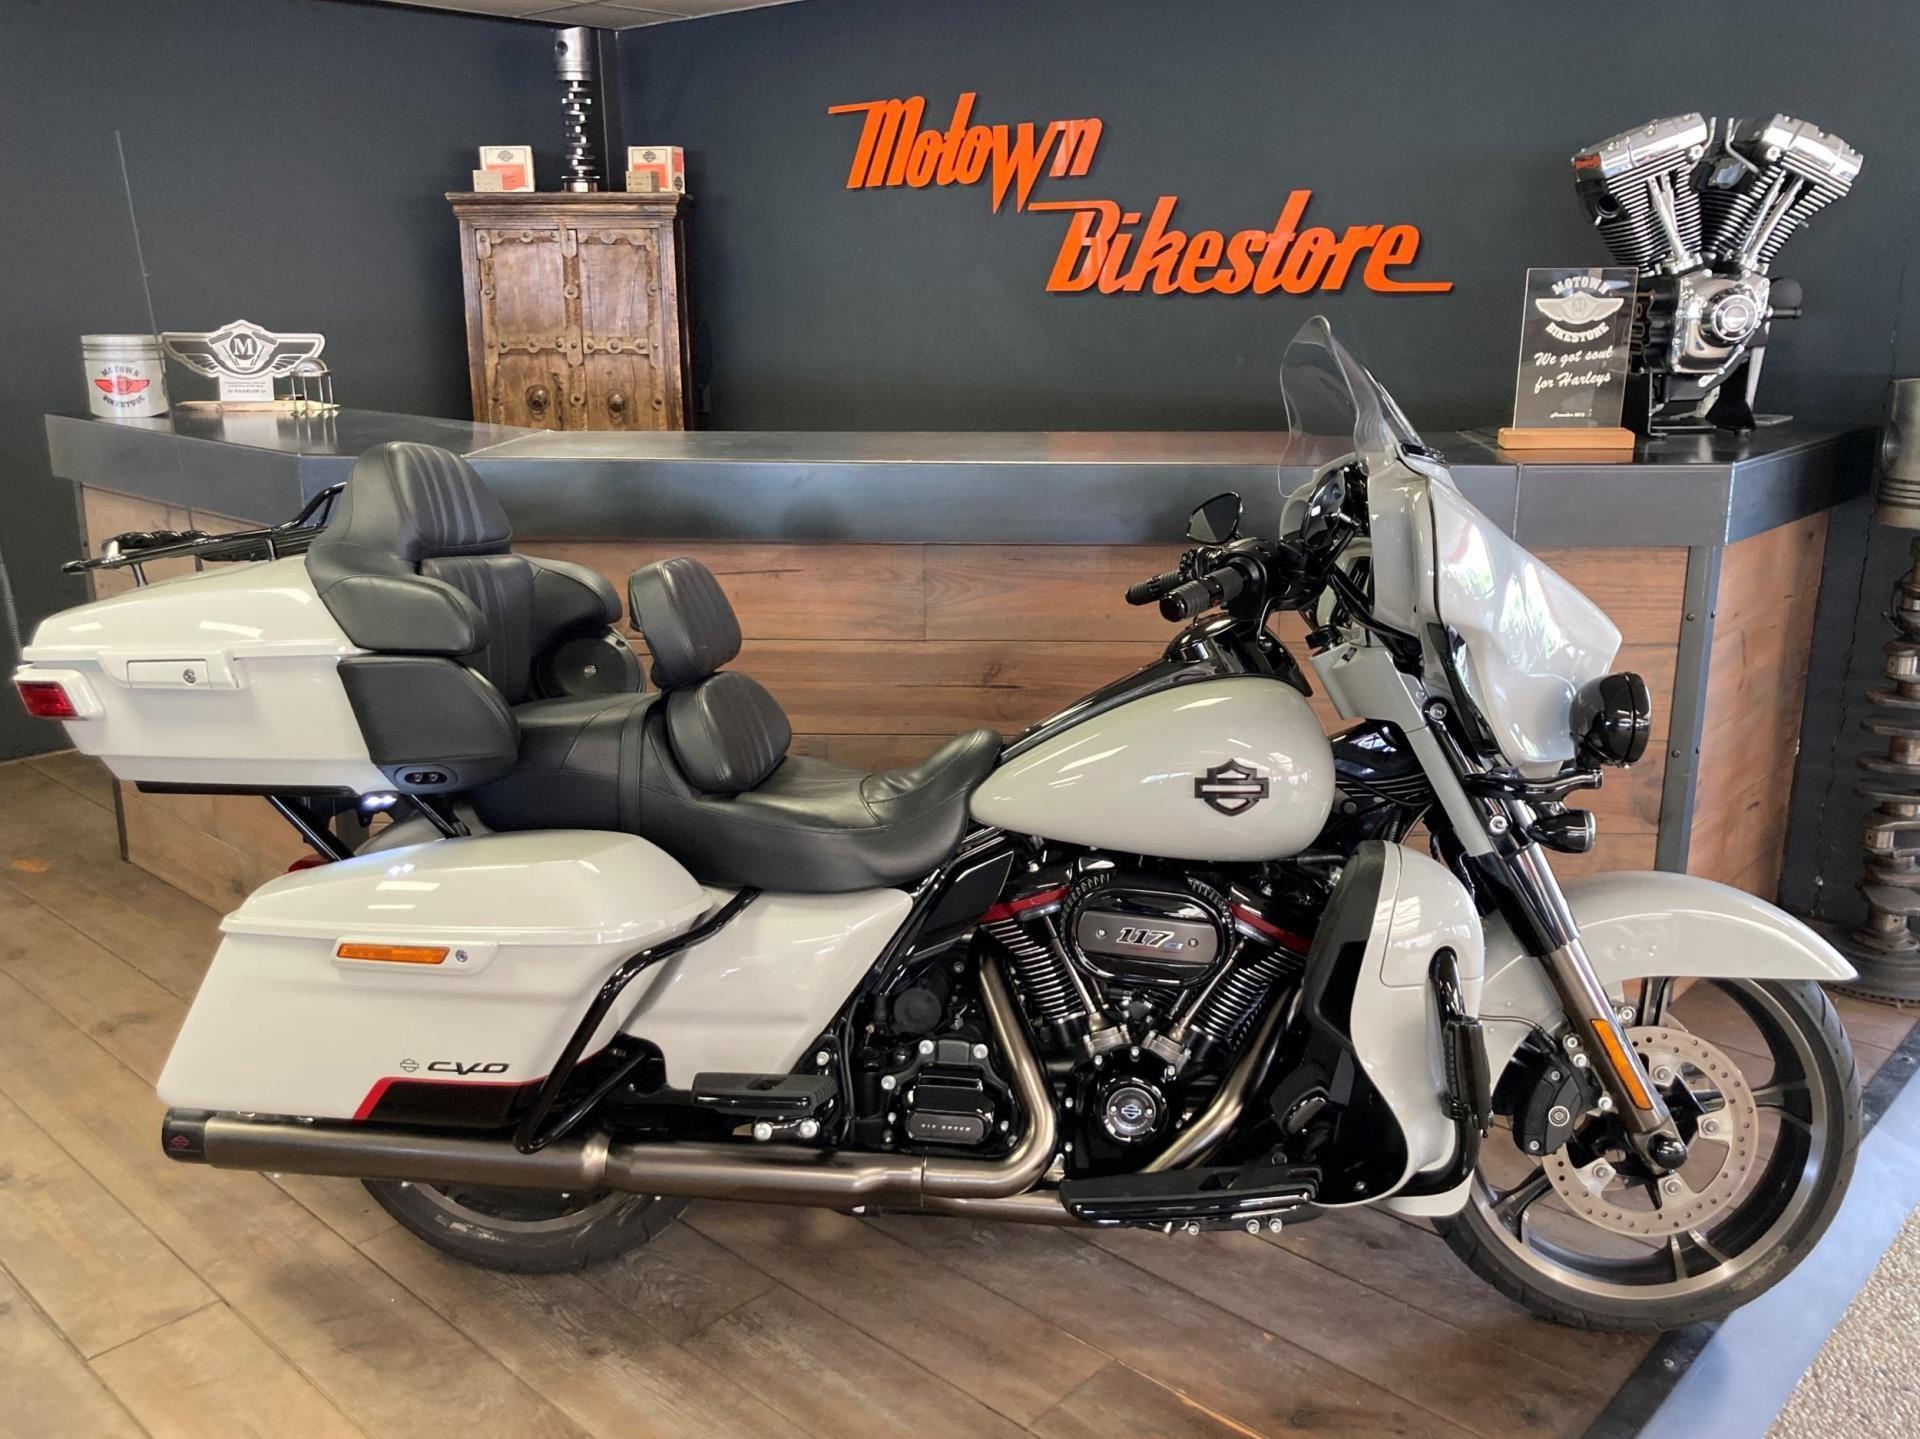 Harley Davidson FLHTKSE CVO Ultra Limited 117Ci occasion - Motown Bikestore